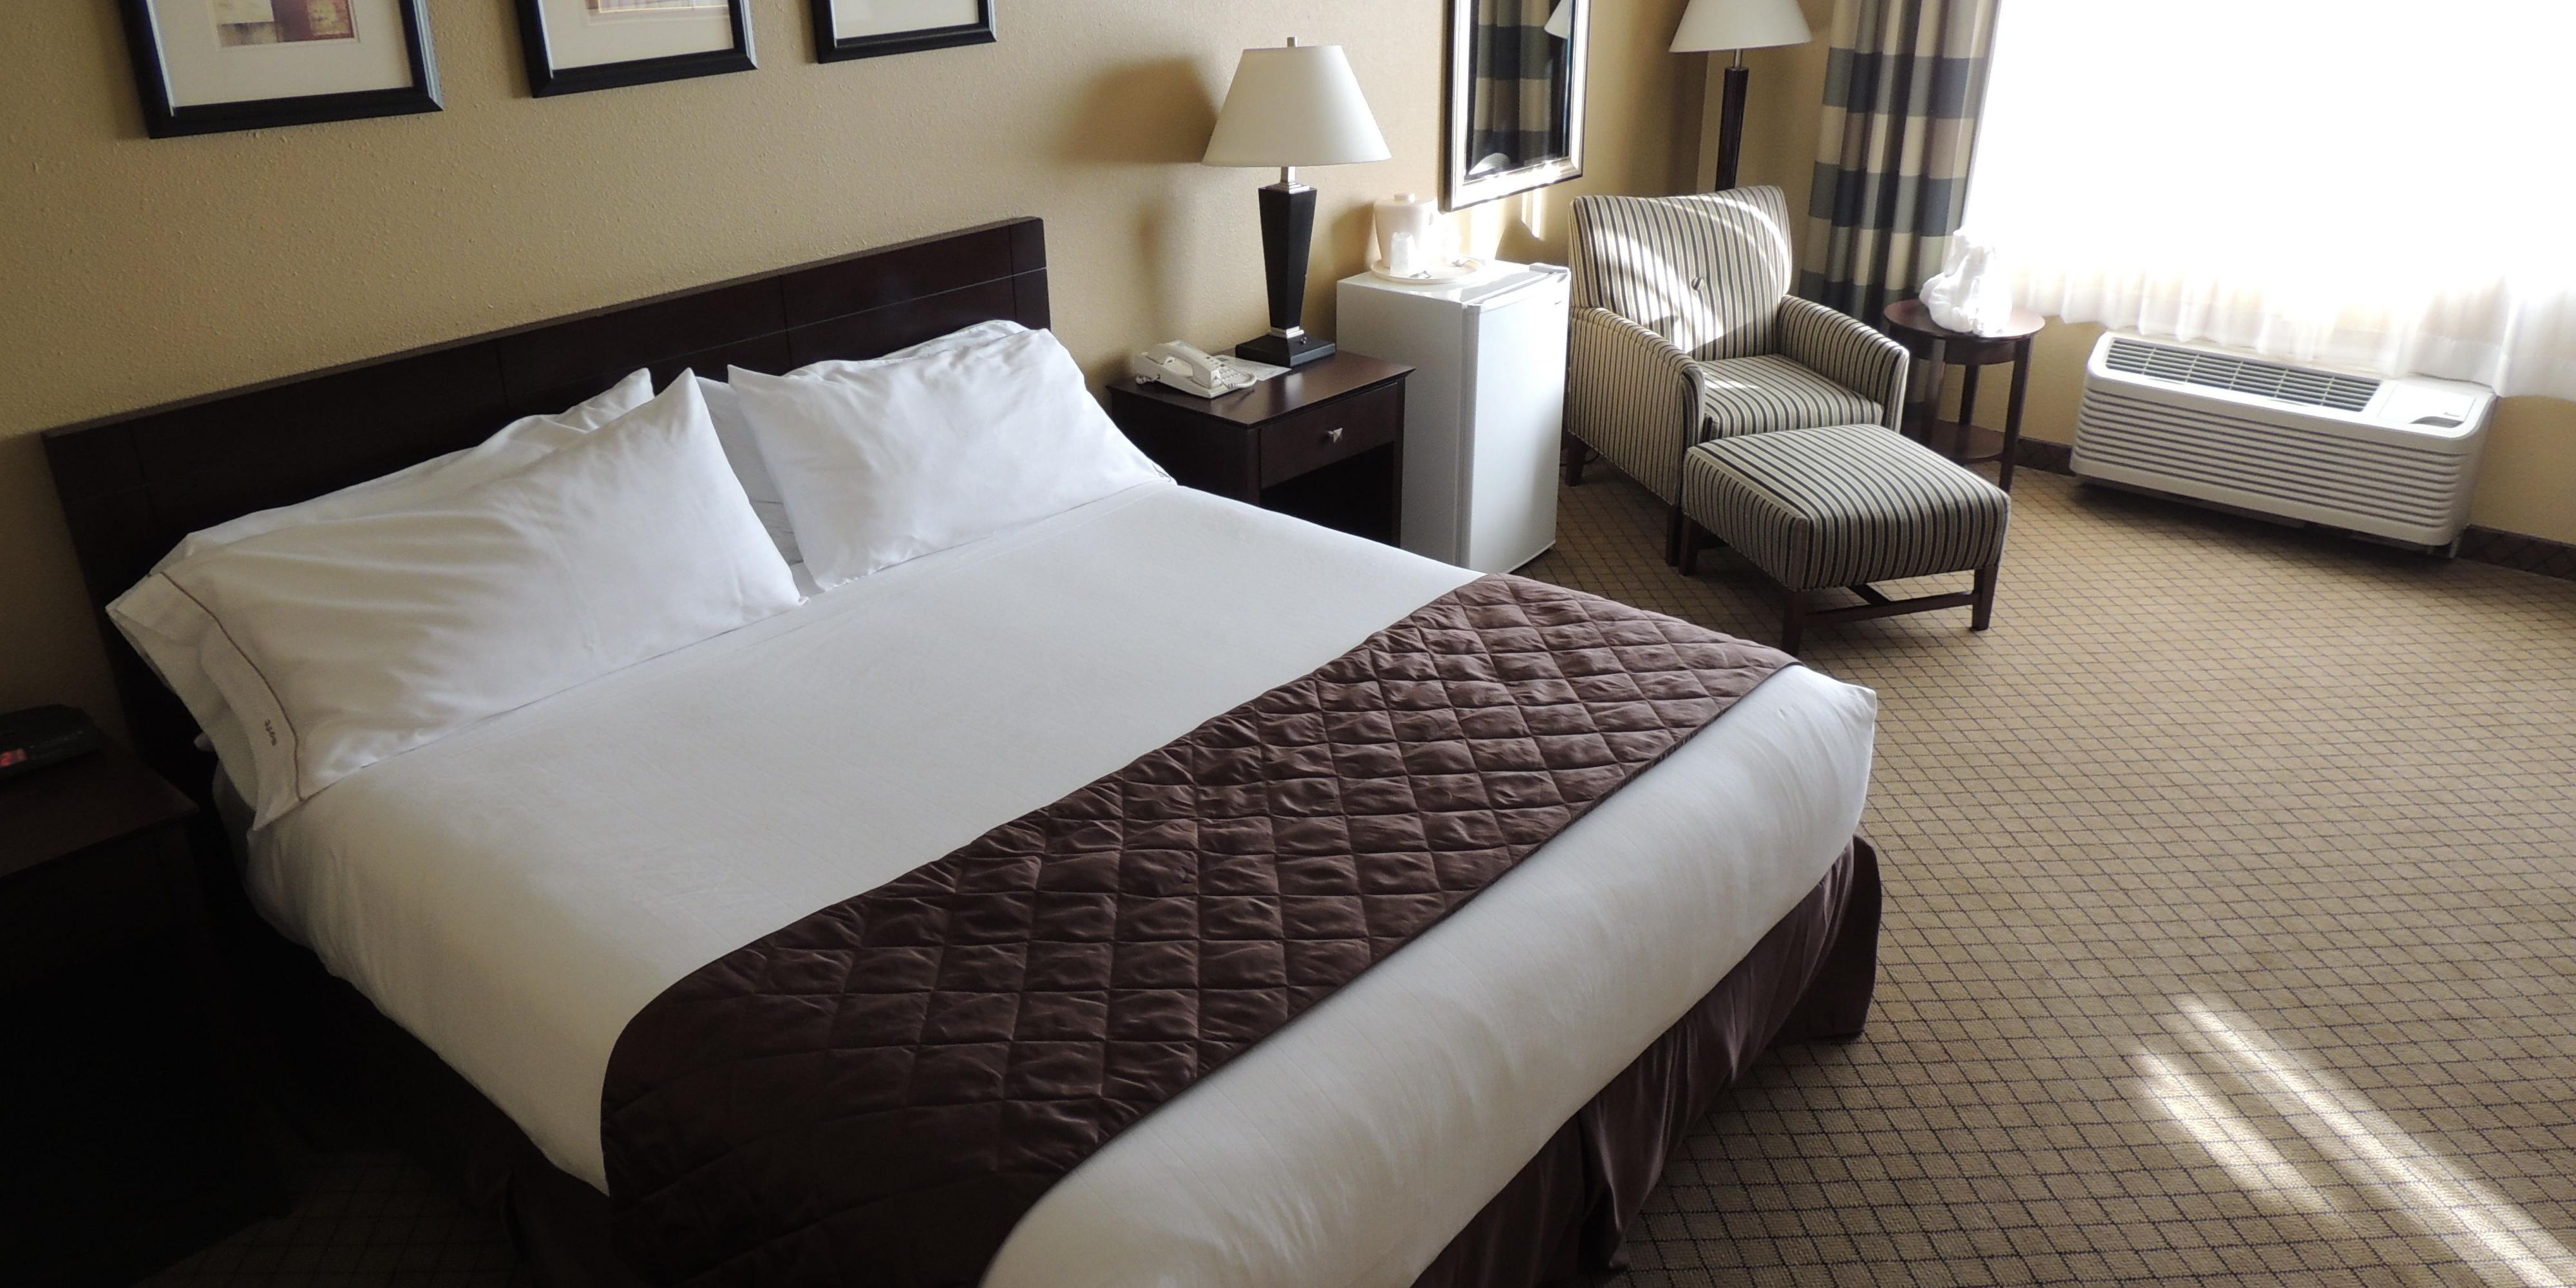 Holiday Inn Express Fallon Hotel by IHG